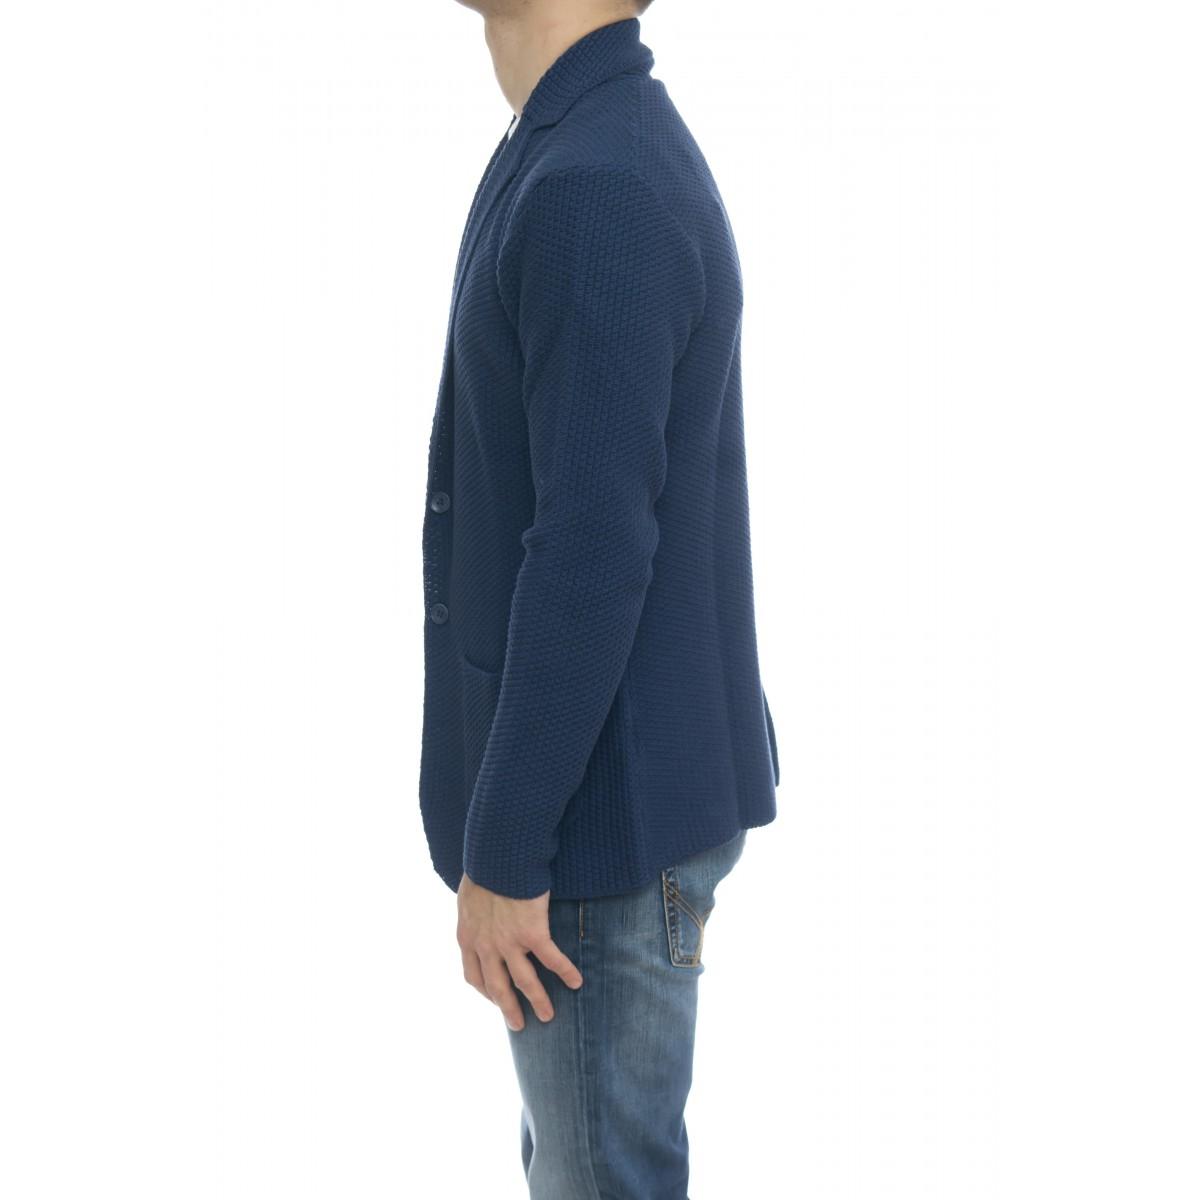 Giacca uomo - 9103/5702 giacca punto canestro